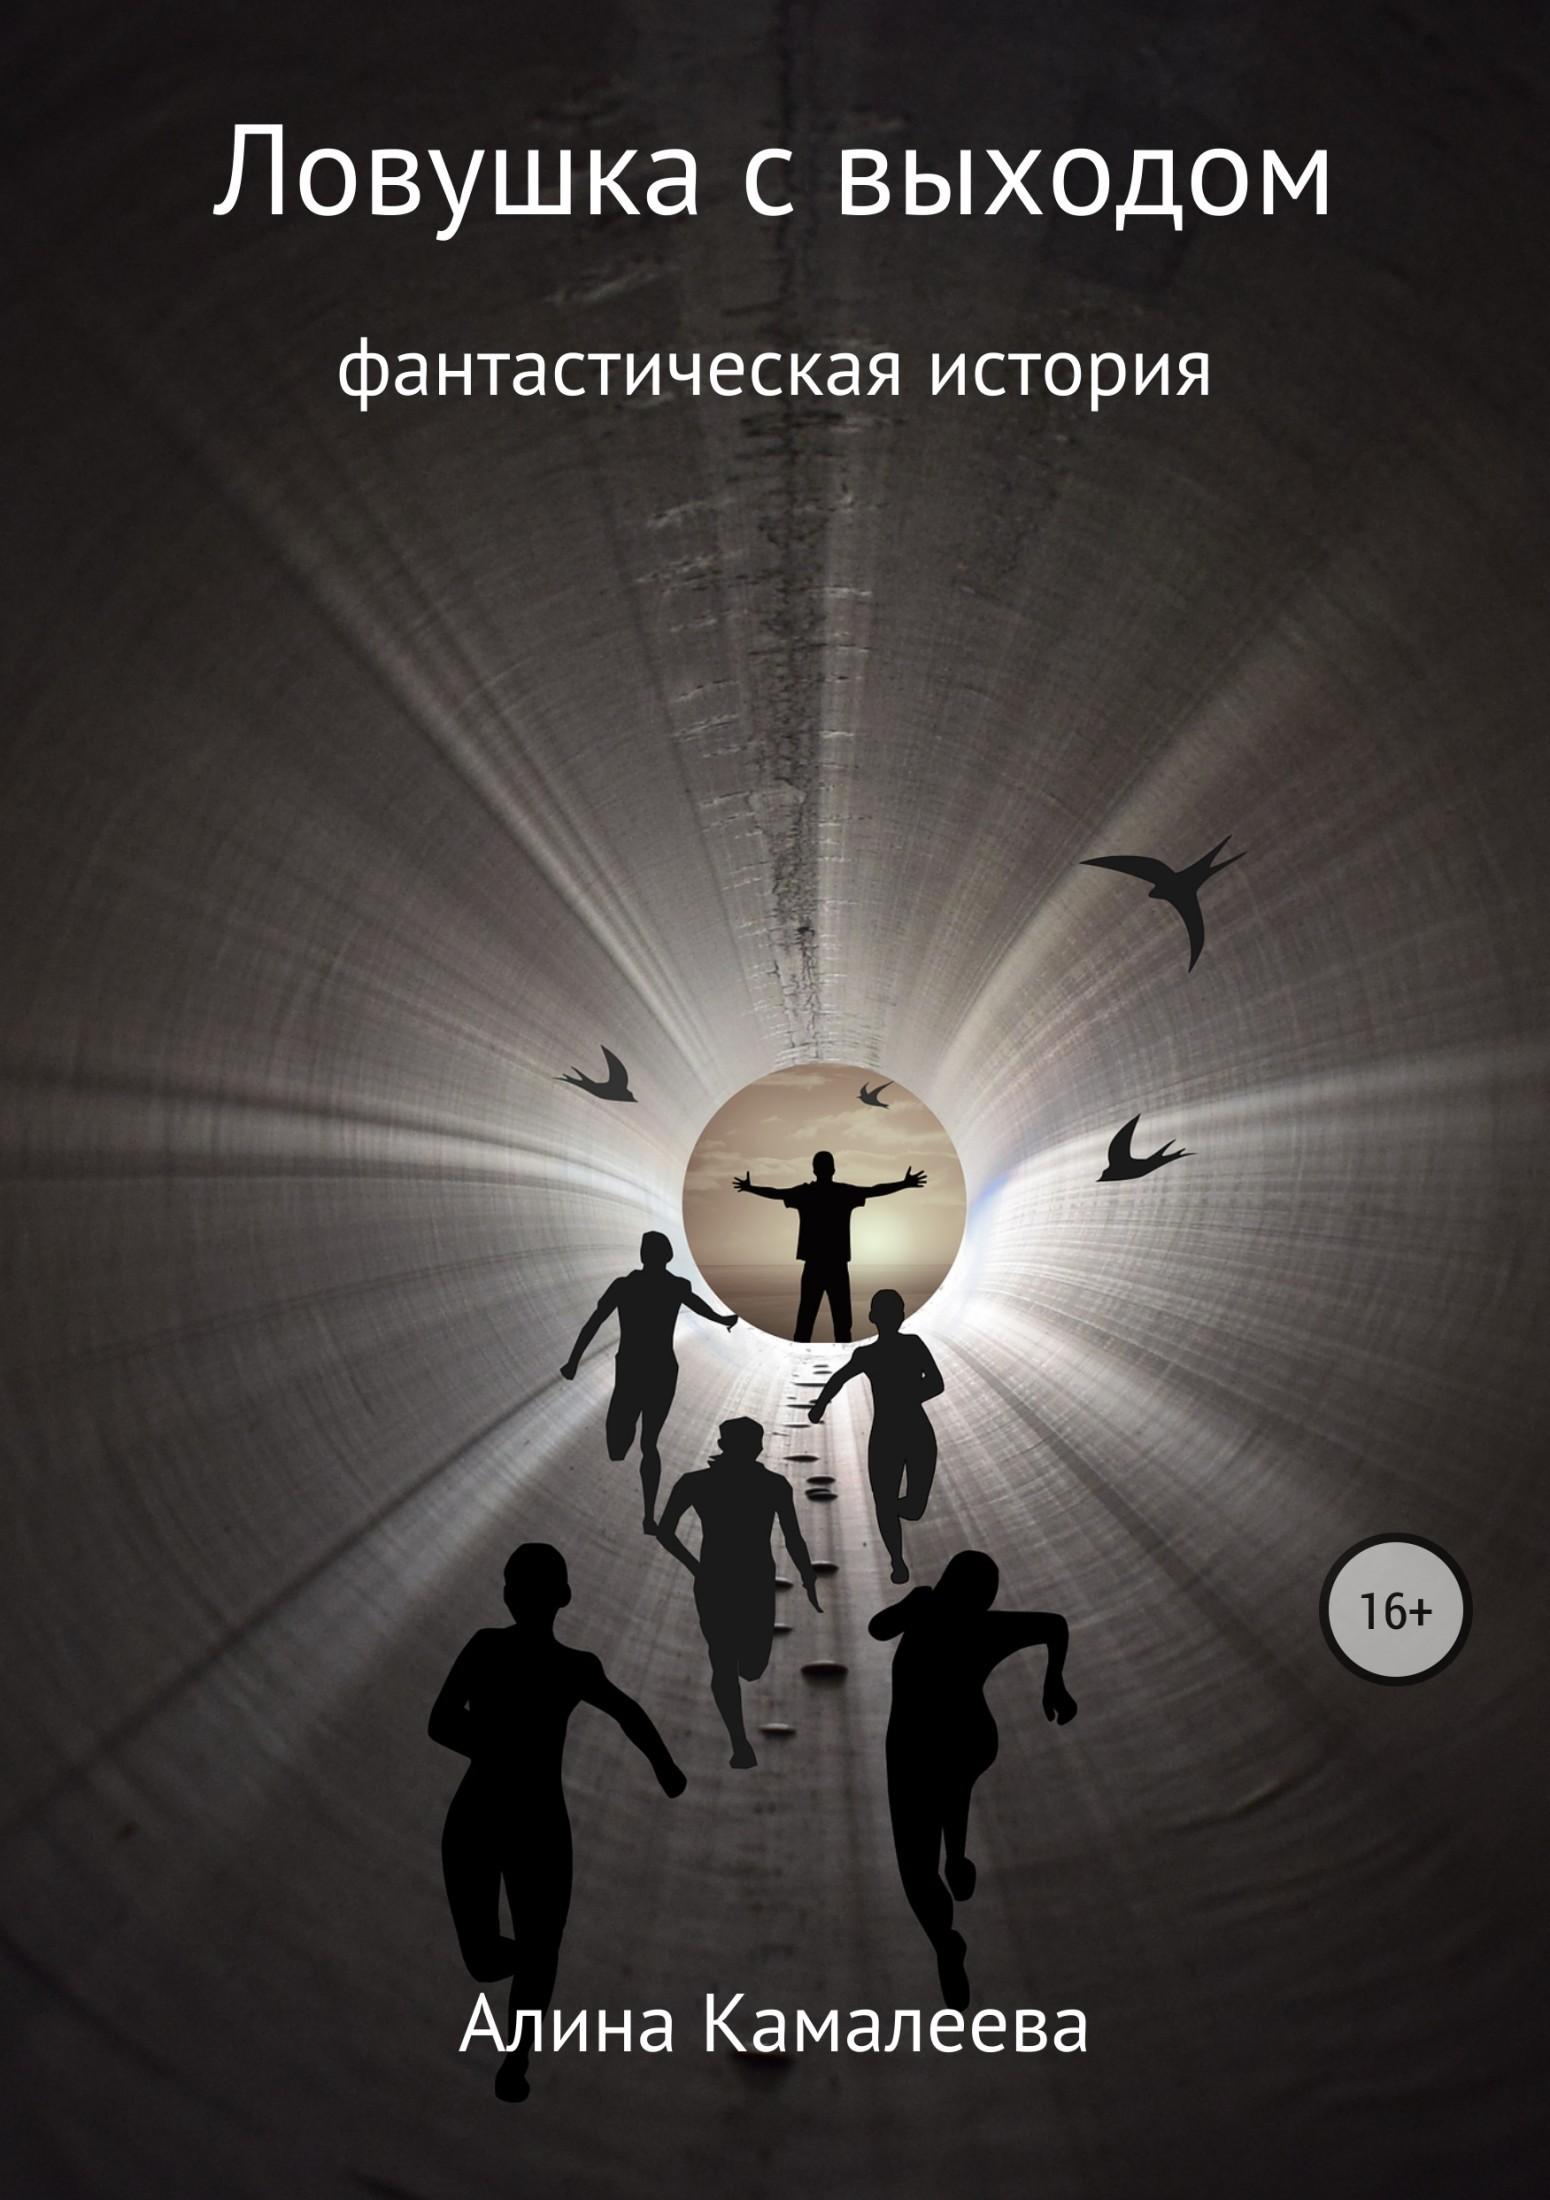 Ловушка с выходом_Алина Камалеева